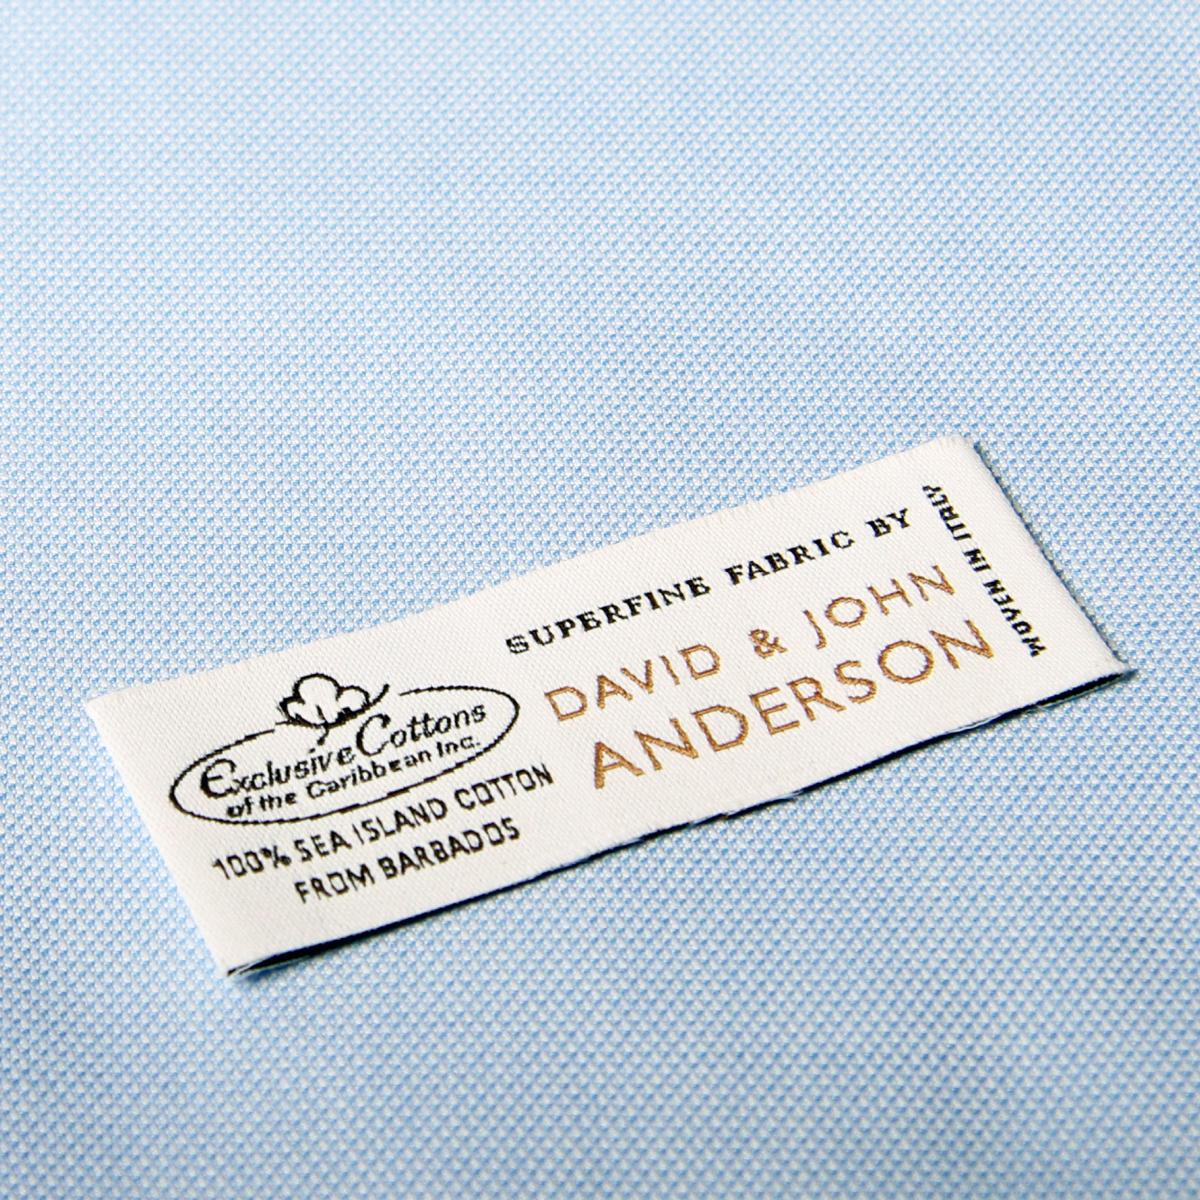 David & John Anderson@Sea Island Cotton@ƒpƒlƒ‹ƒf[ƒ^227mm@~